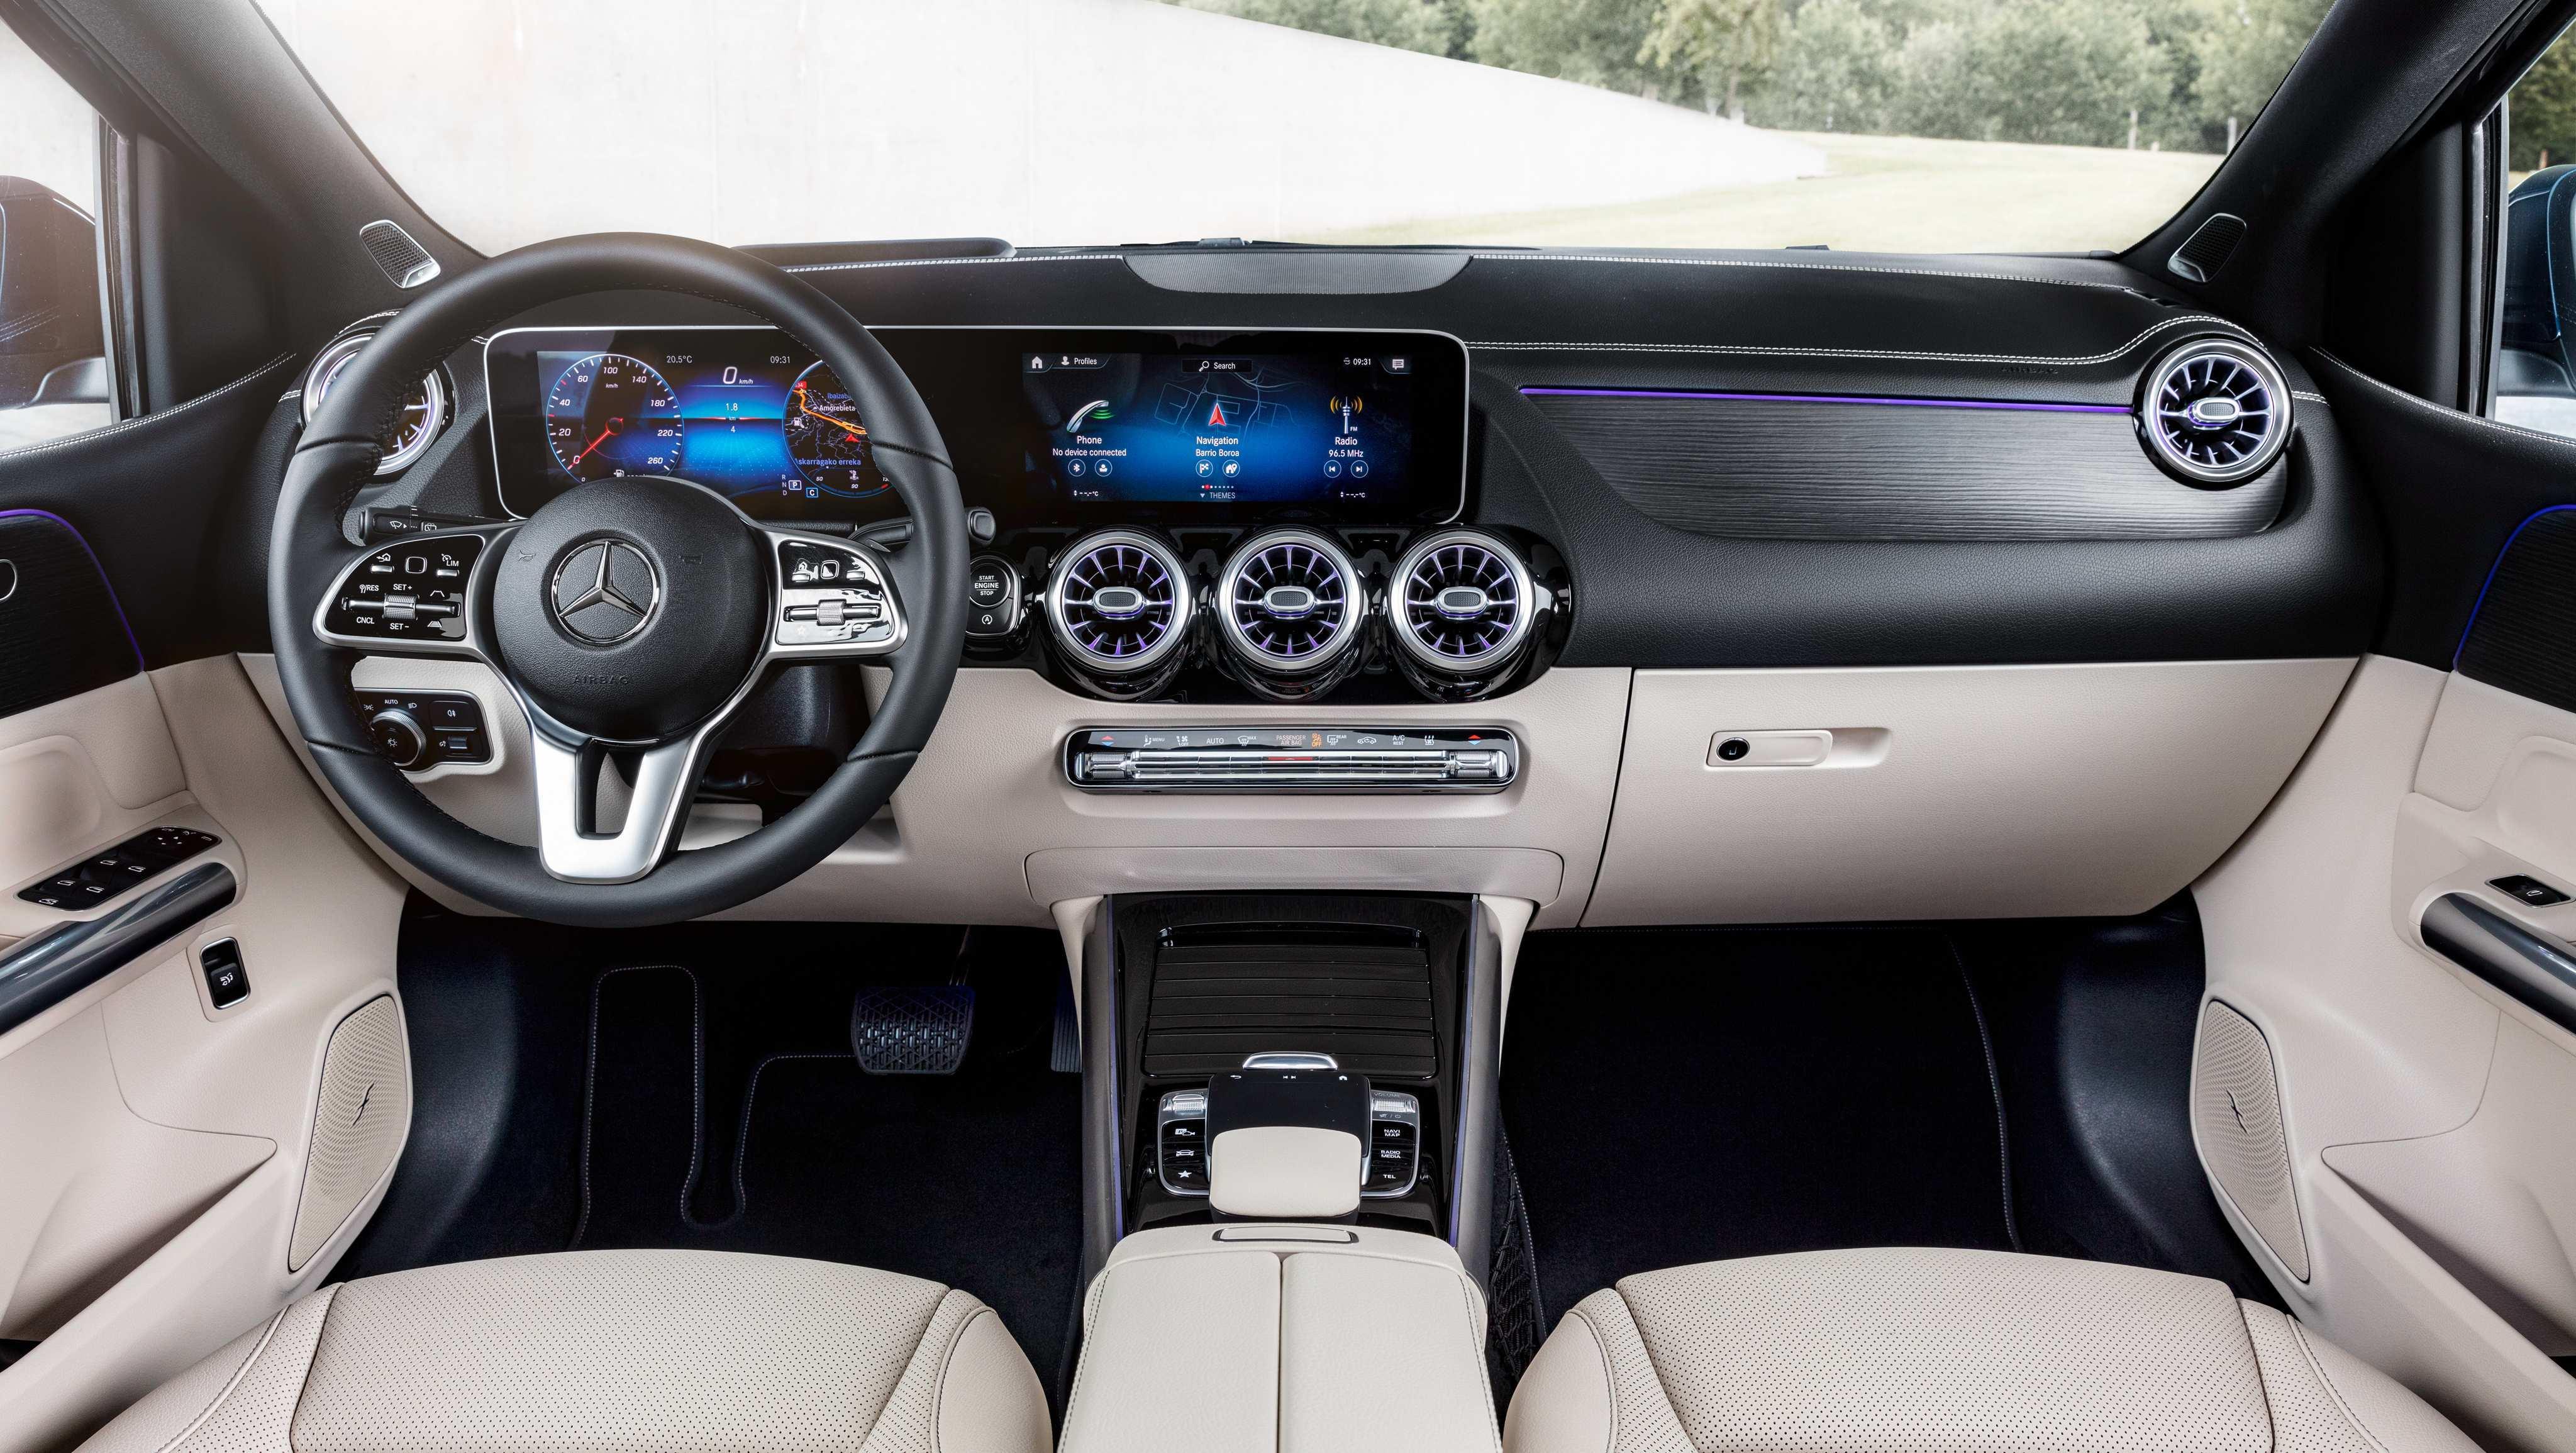 84 Best Review Mercedes B Klasse 2019 Overview with Mercedes B Klasse 2019